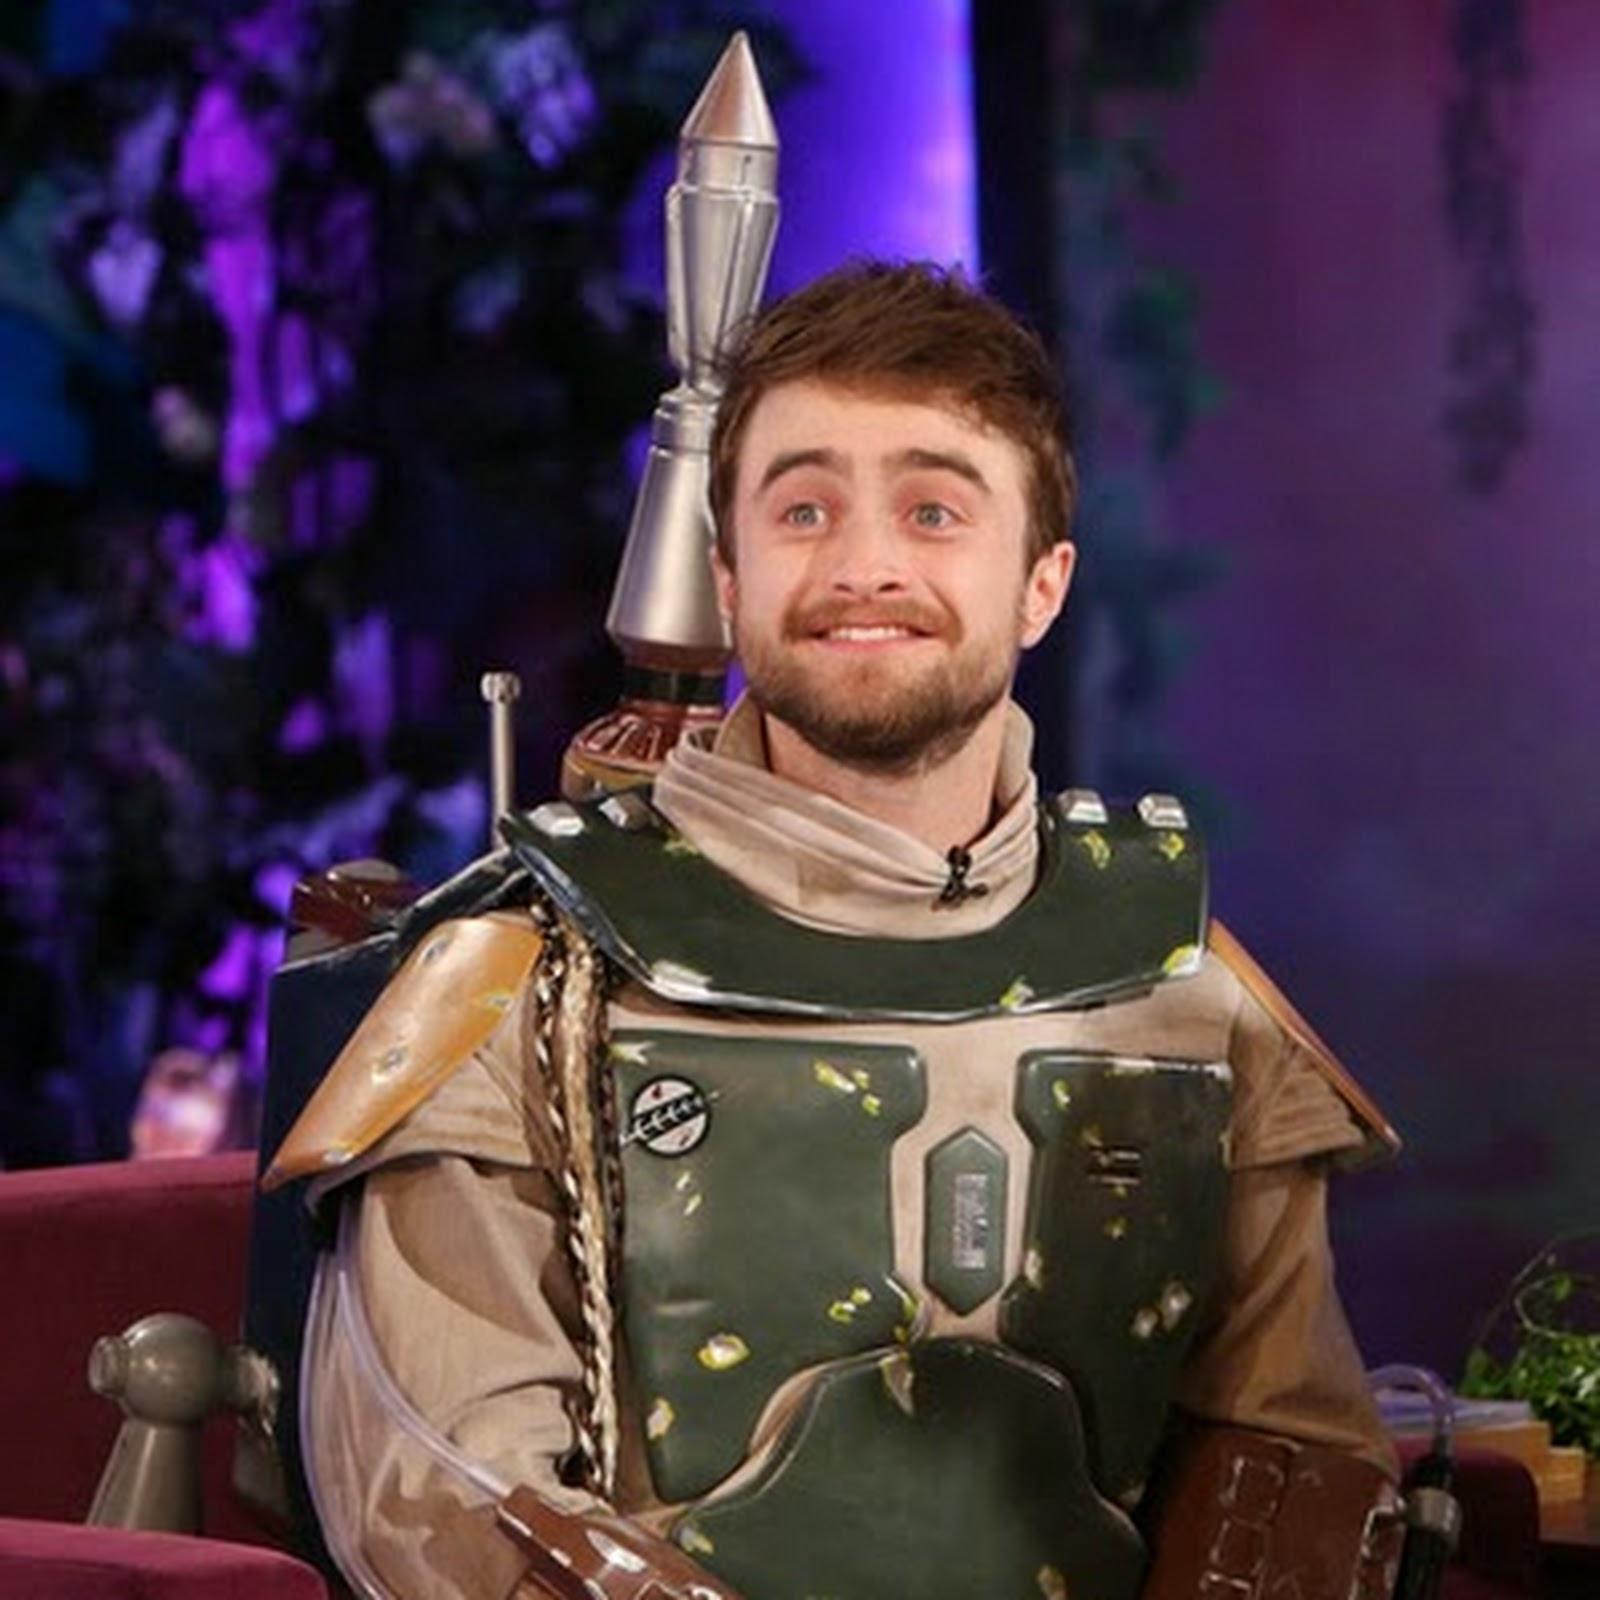 Updated: Daniel Radcli... Daniel Radcliffe